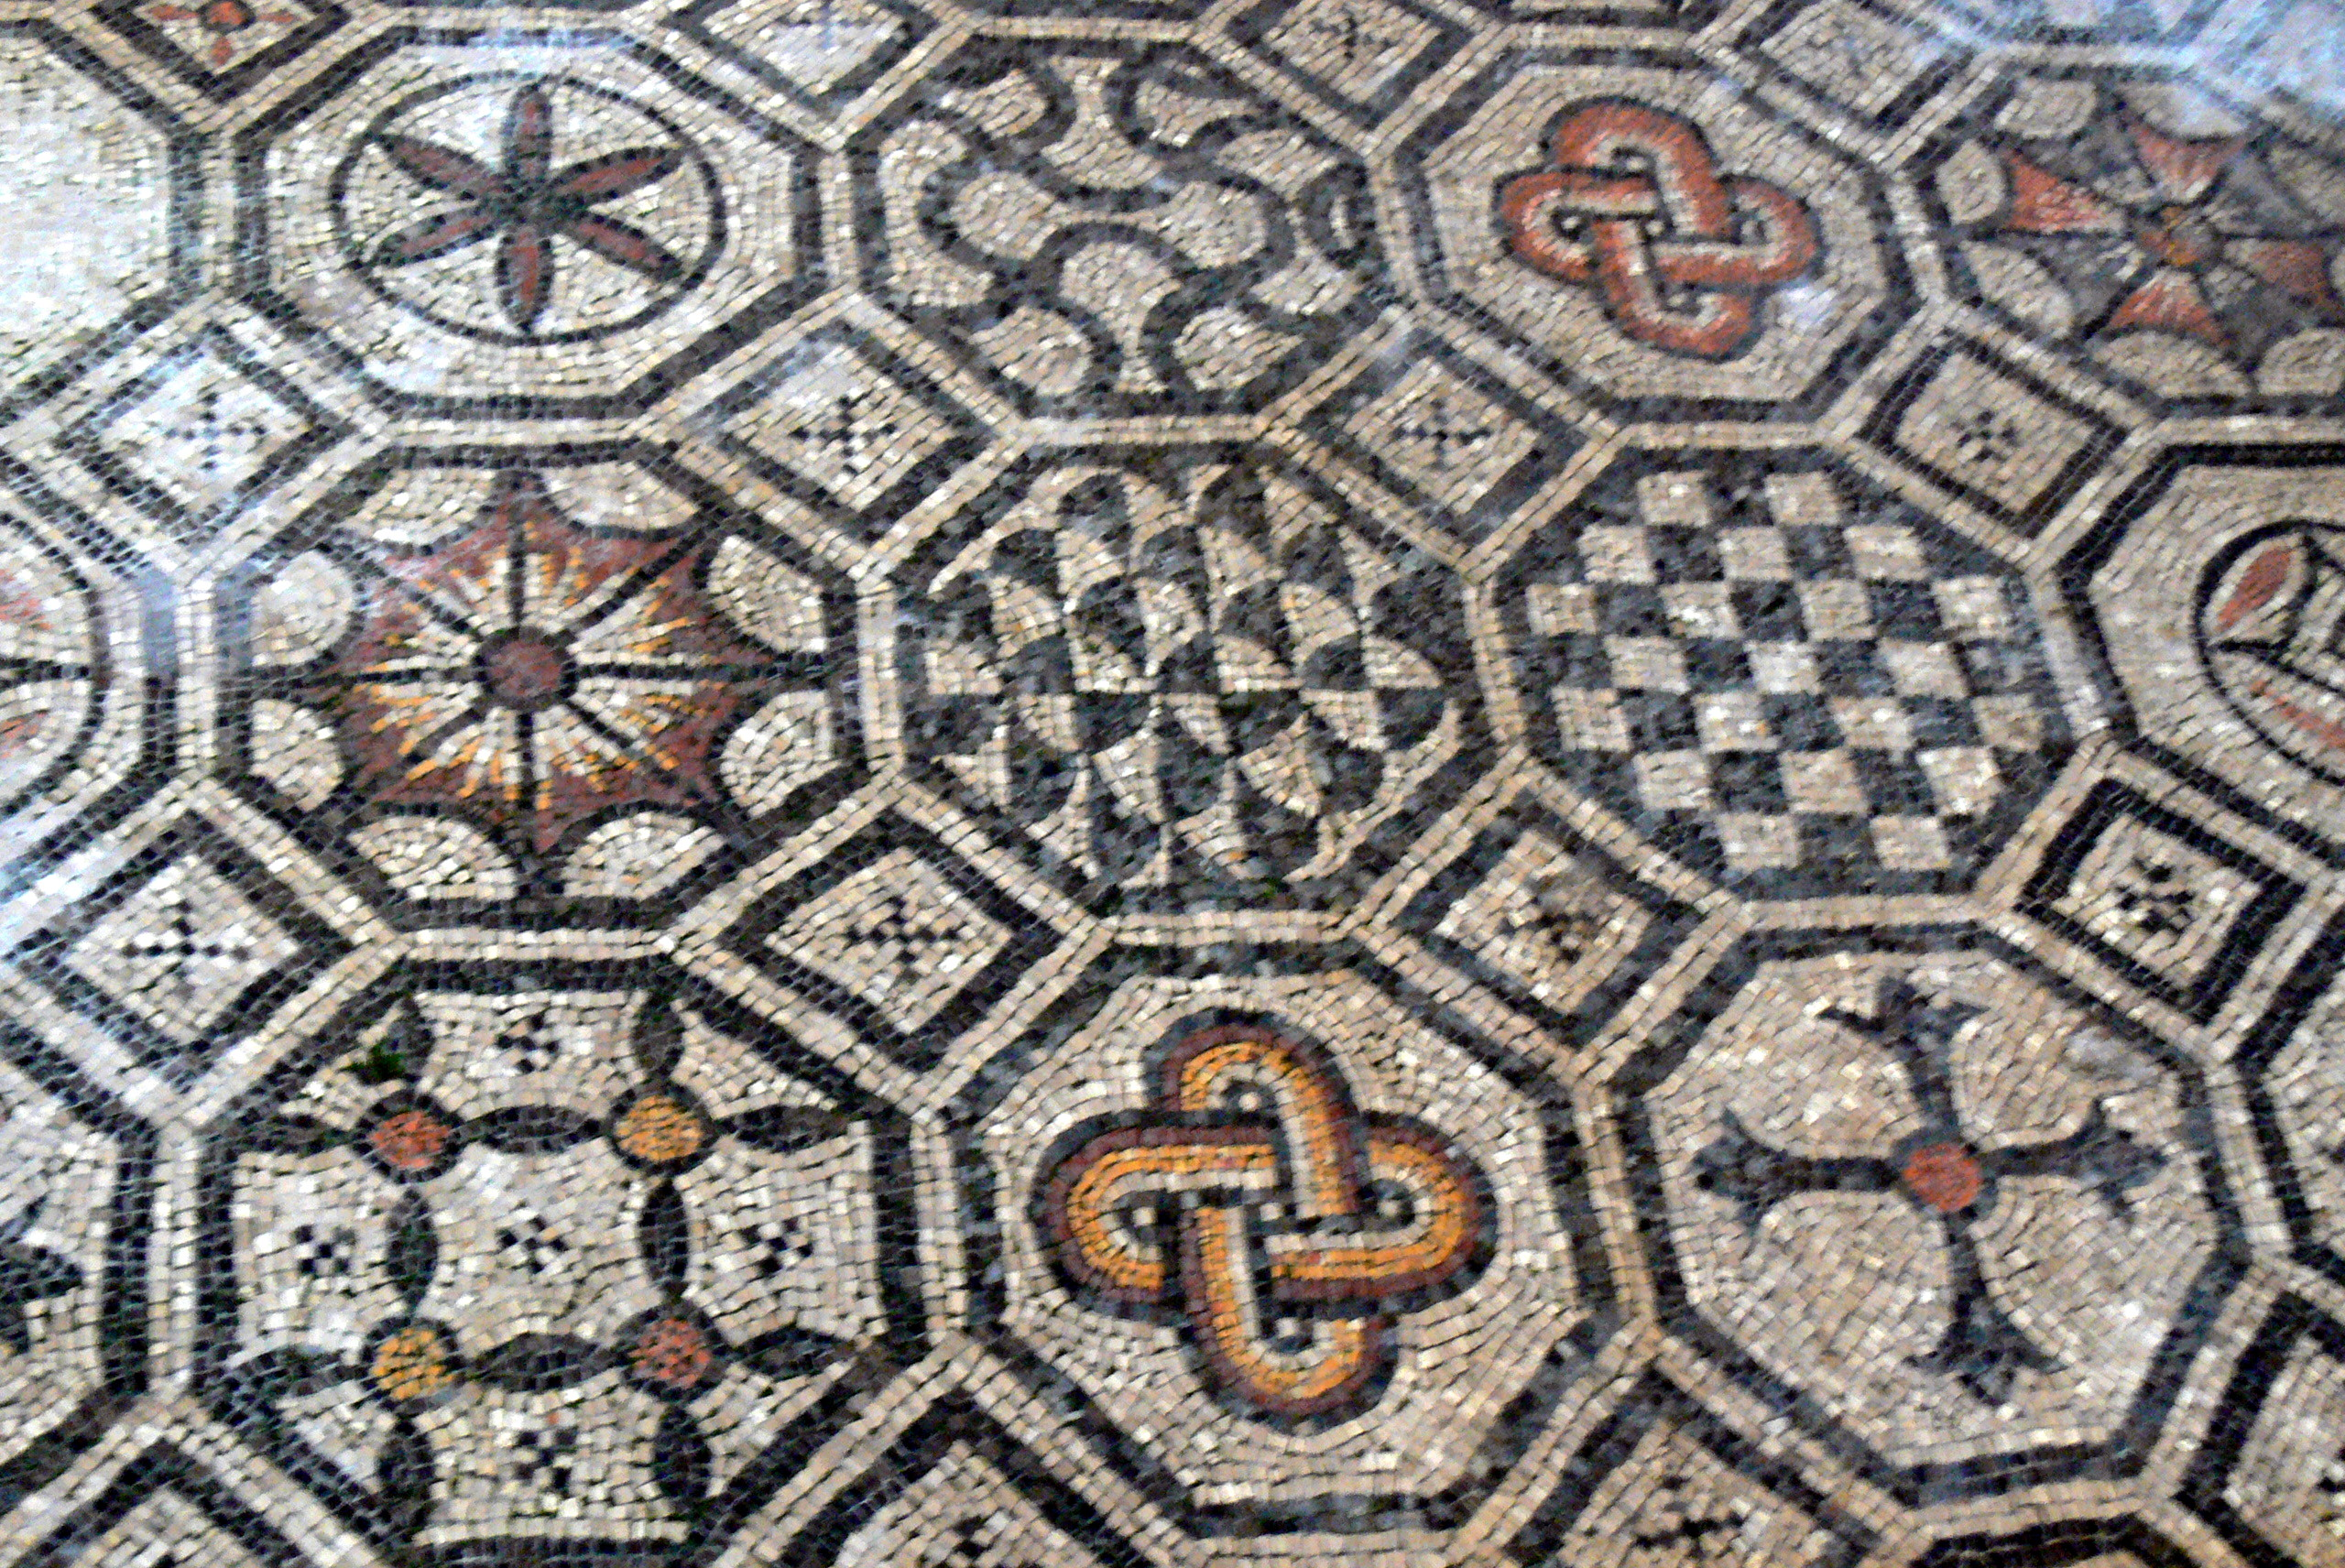 fileaquileia basilica mosaik 2 geometrische musterjpg - Mosaik Muster